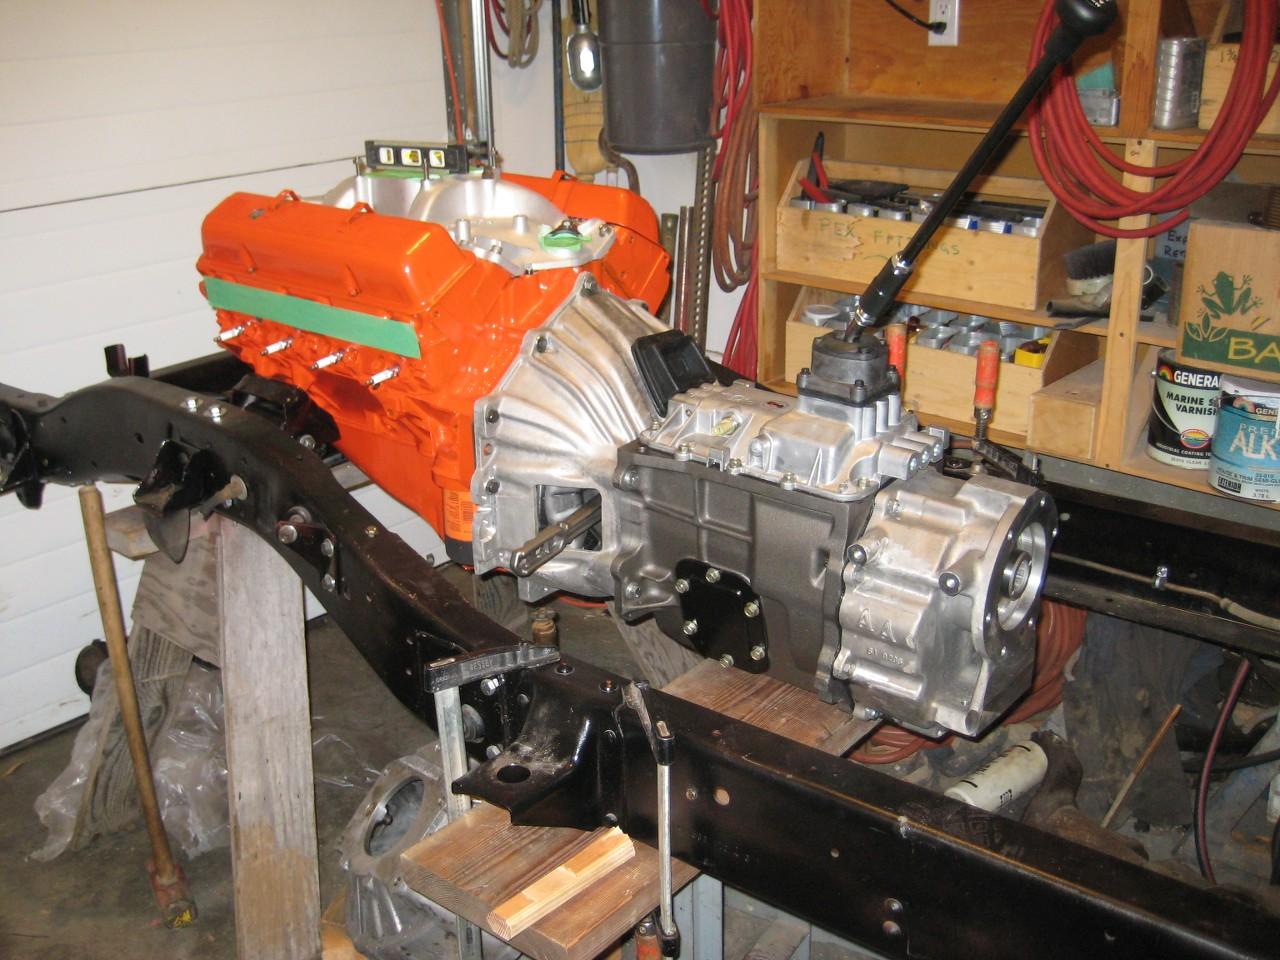 Engine for '61 apache - Chevy Message Forum - Restoration